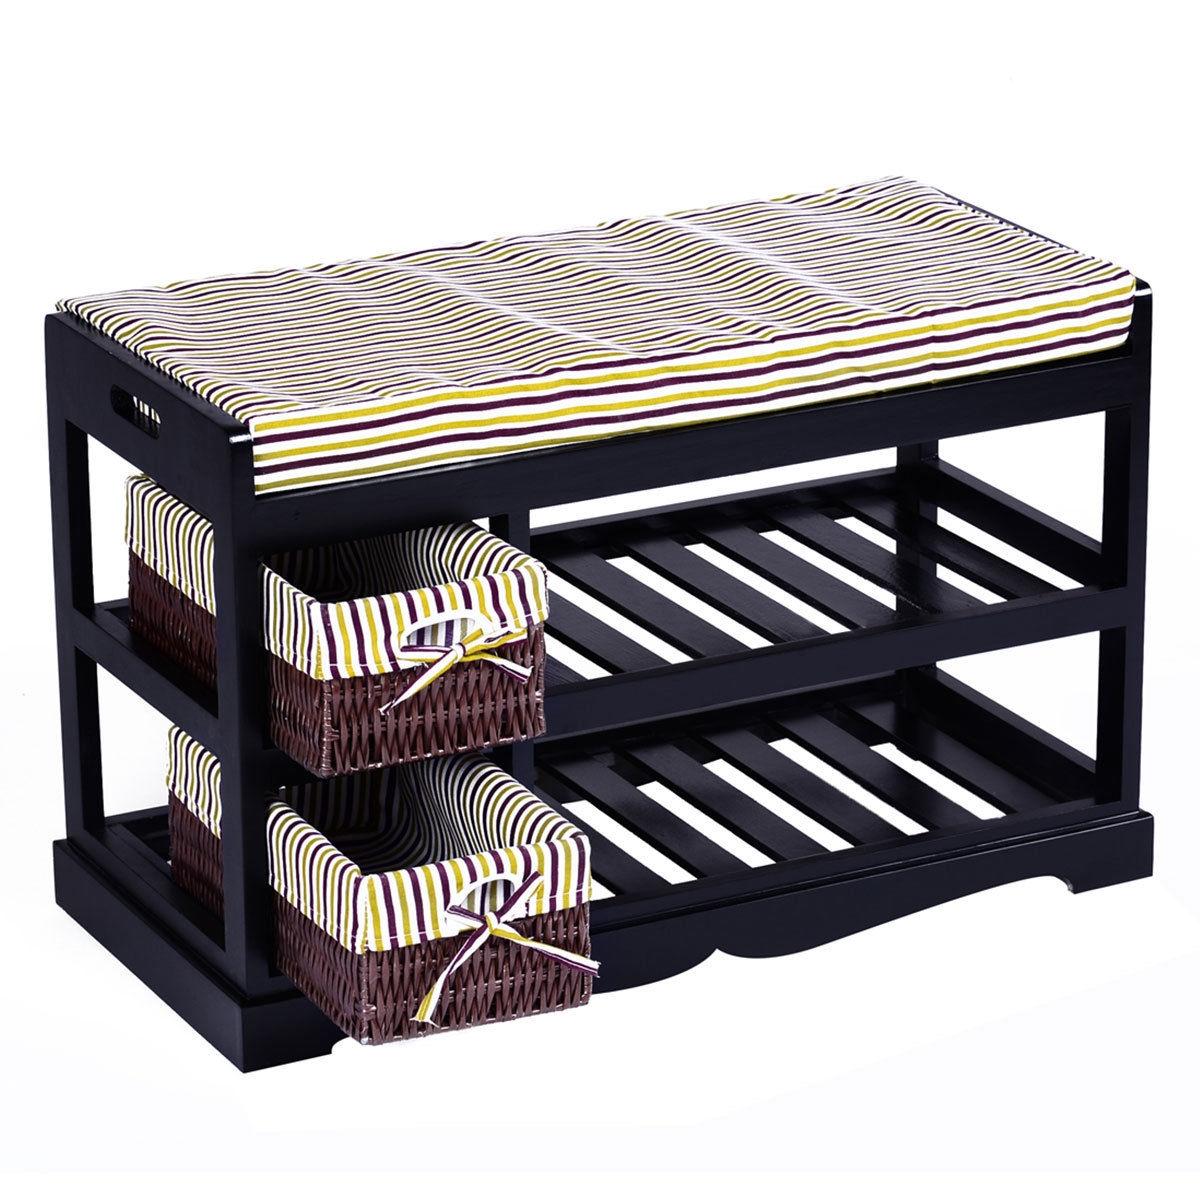 2 Basket Padded Entryway Shoe Storage Bench Rack-Black